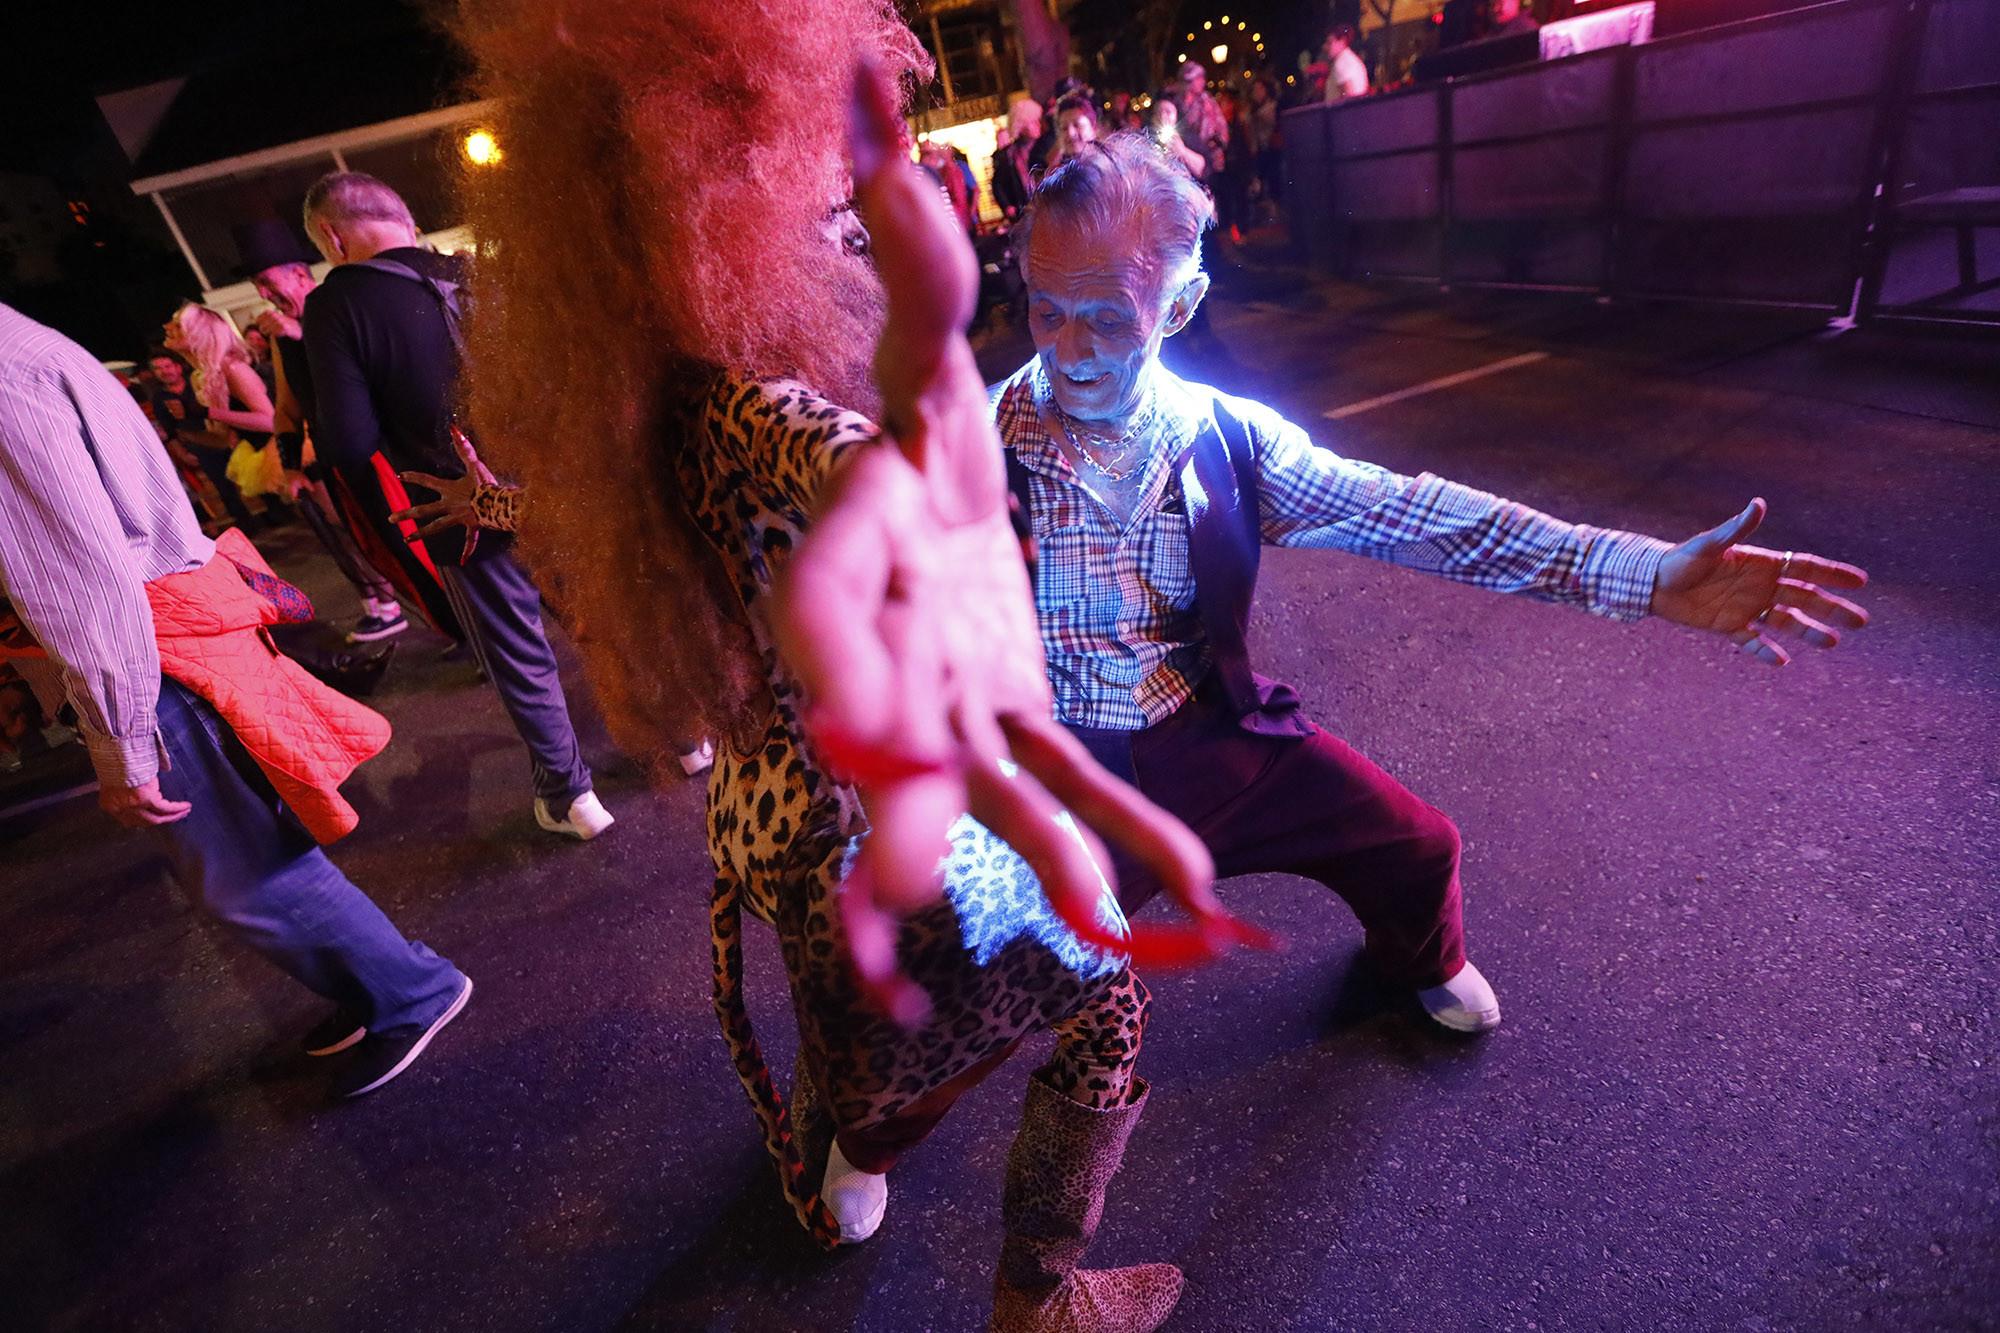 WEST HOLLYWOOD, CA Ð OCTOBER 31, 2018 - - Dolly Boyd, center, dances with Abbas Hashei, 74, right,